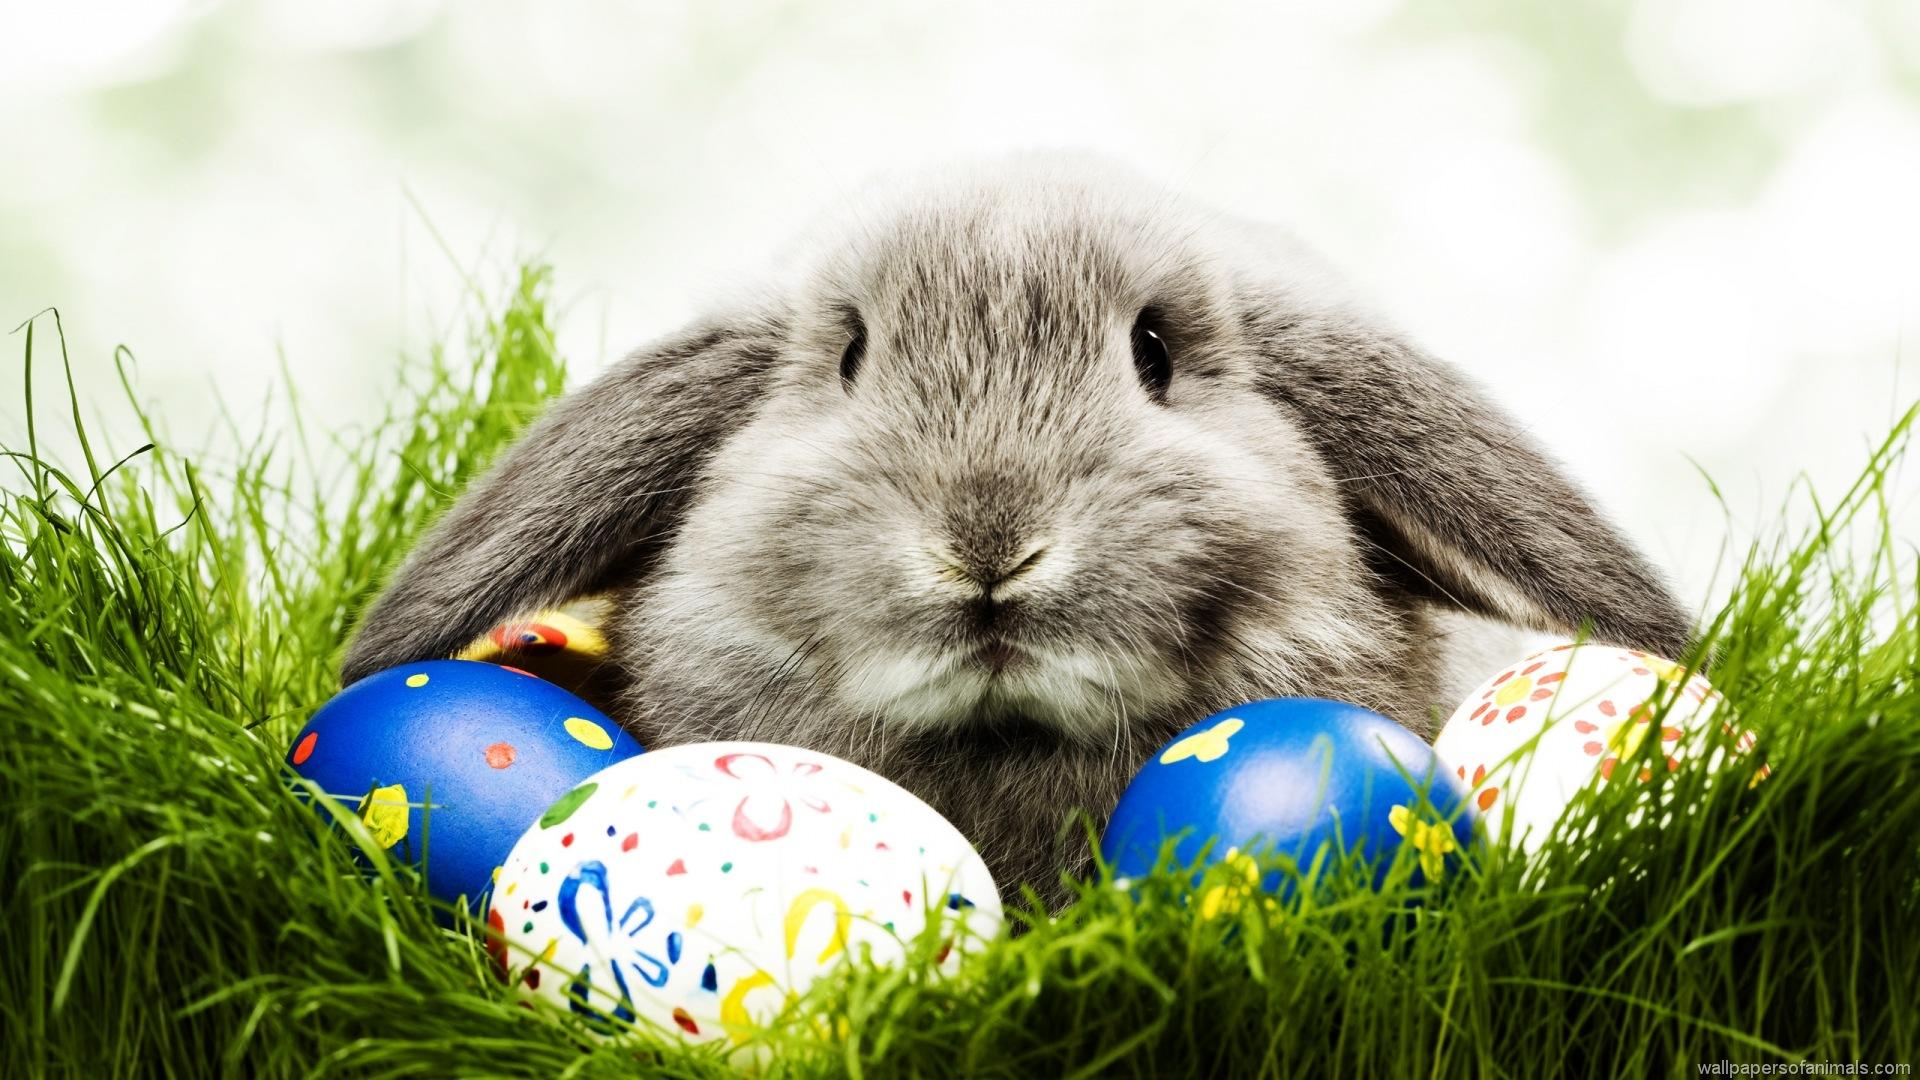 Conejo y huevos de pascua. (http://newevolutiondesigns.com/20-hd-easter-wallpapers)